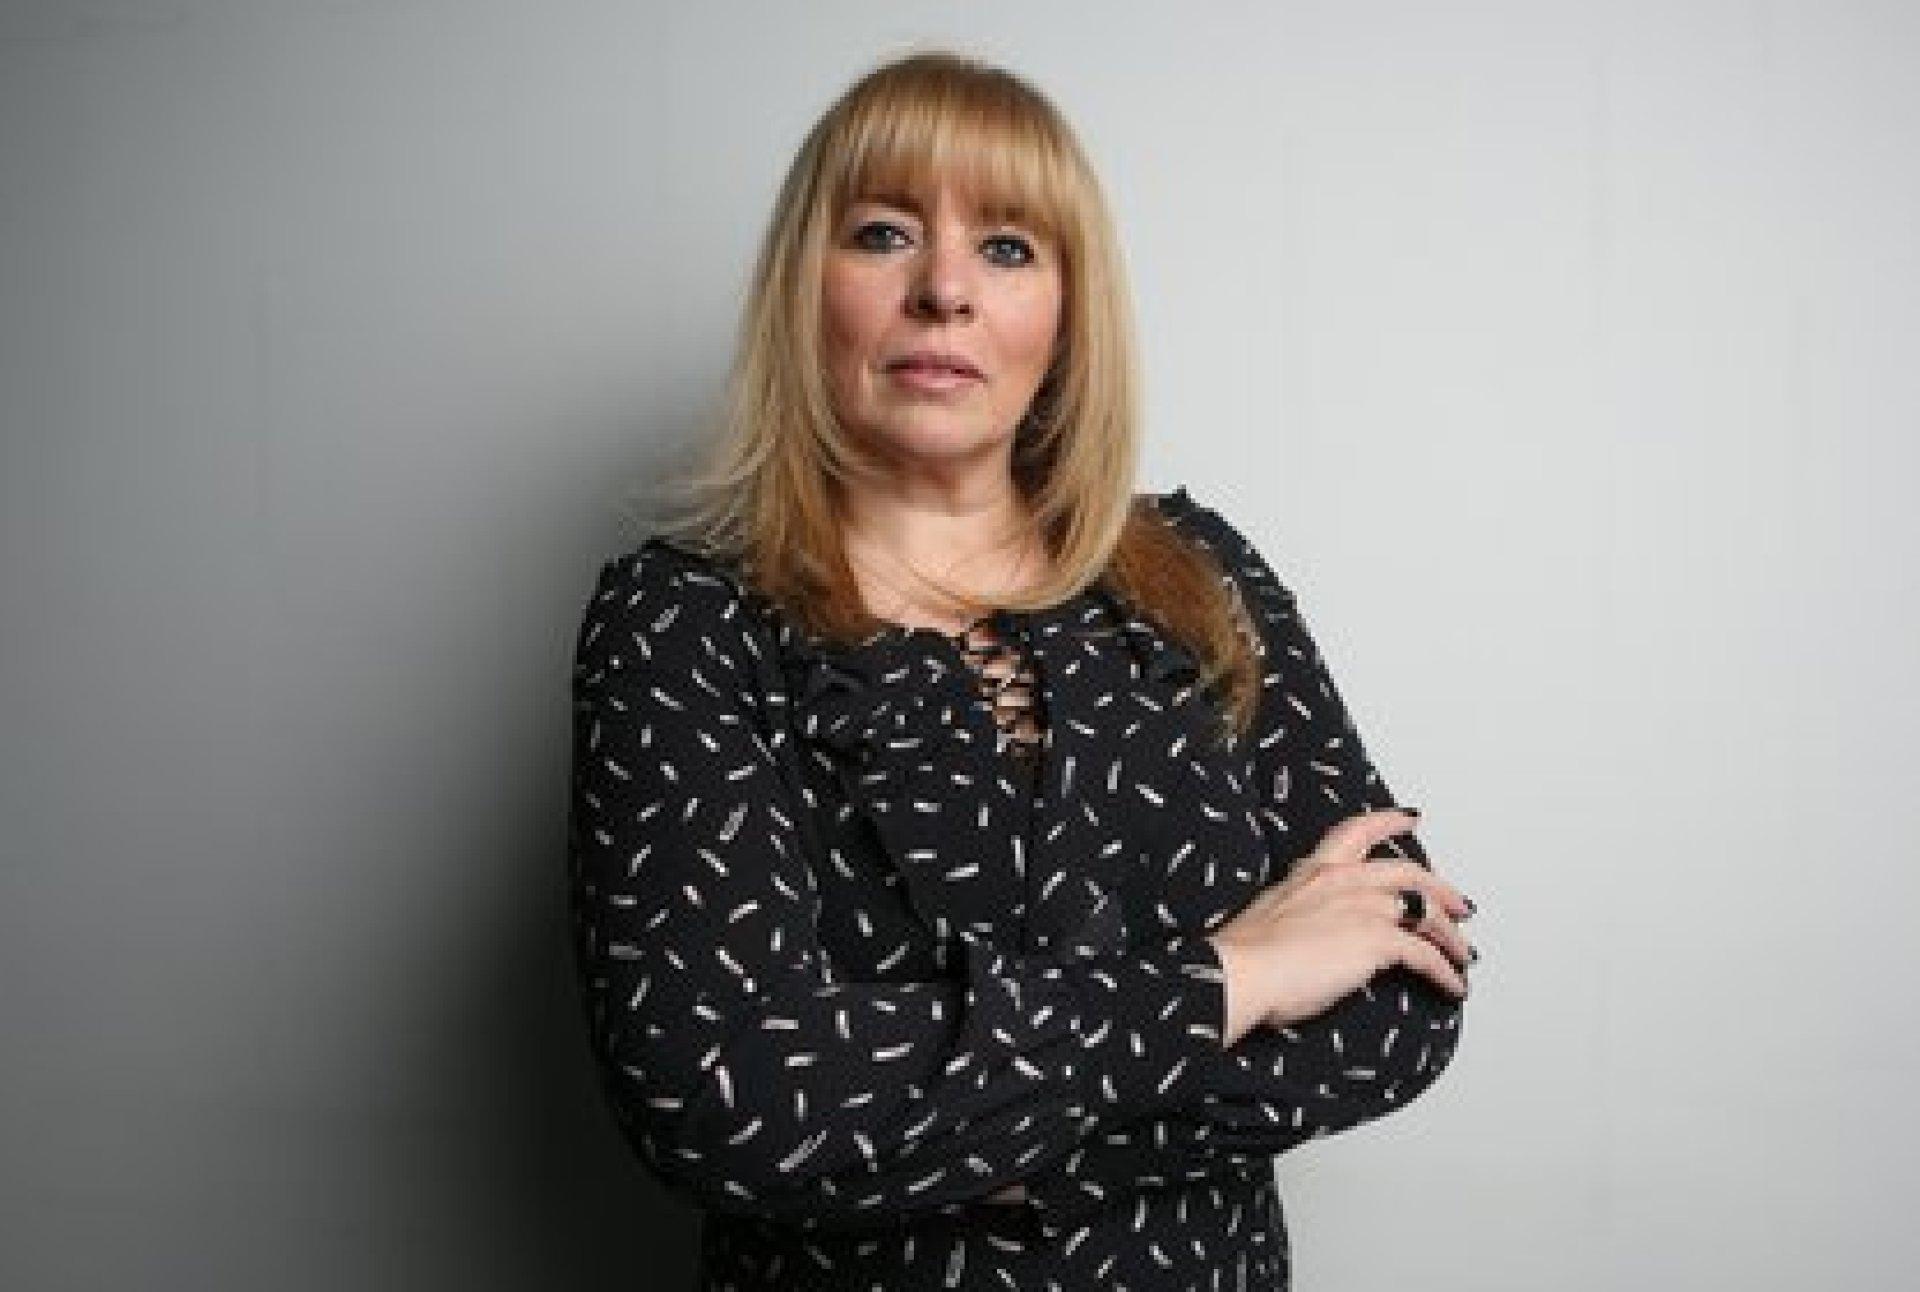 La jueza Karina Perilli (Agustin Marcarian)